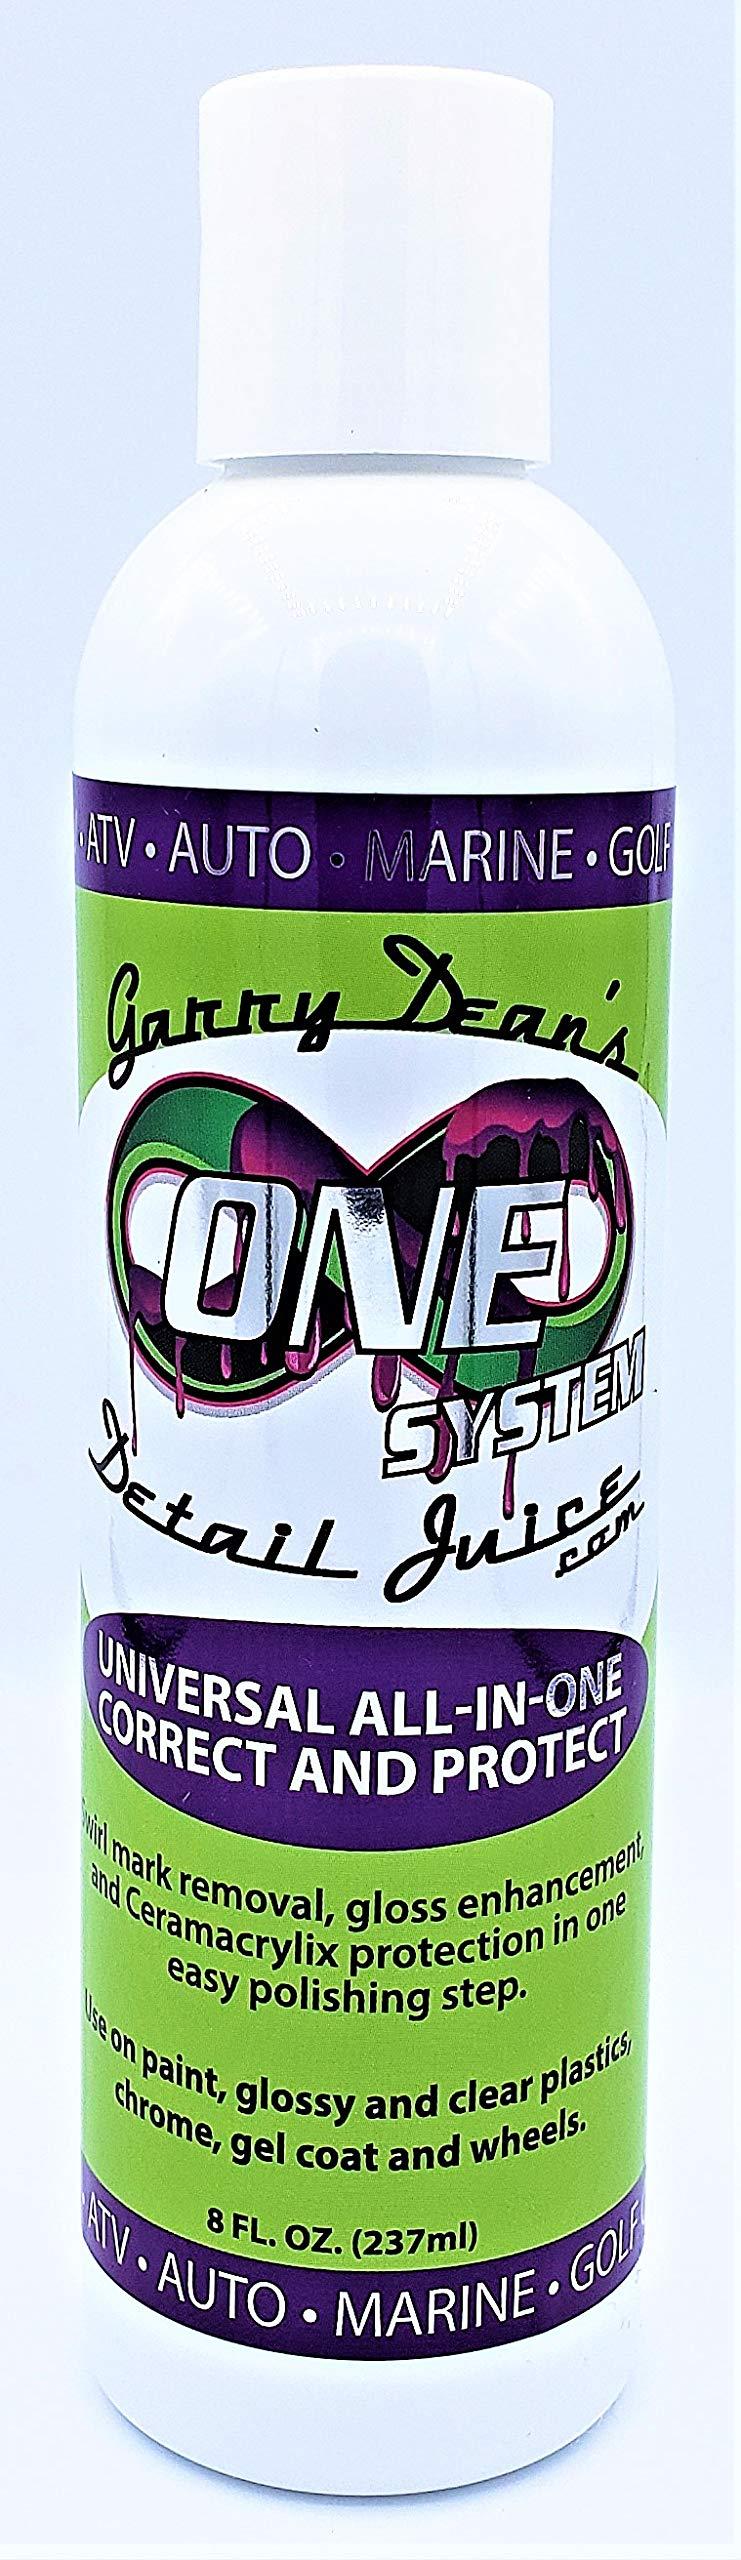 Detail Juice Garry Dean's ONE System Universal All in One Polish Automotive Detailing Supplies Paint, Clear Plastics, Chrome, Gel Coat, Wheels (8 fl oz)